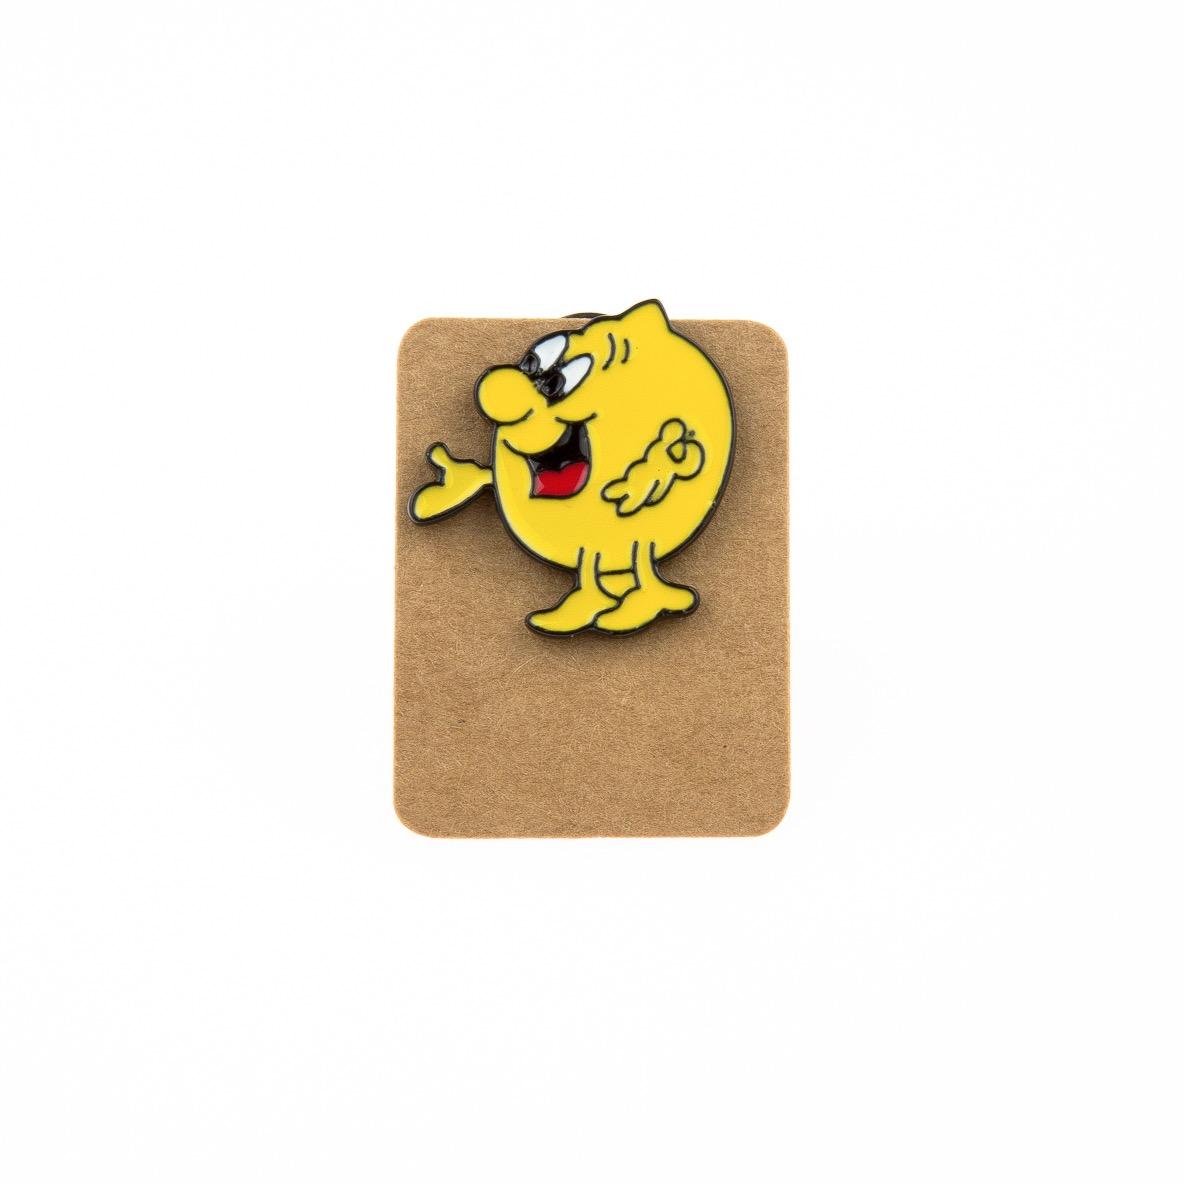 Metal Lemon Man Enamel Pin Badge